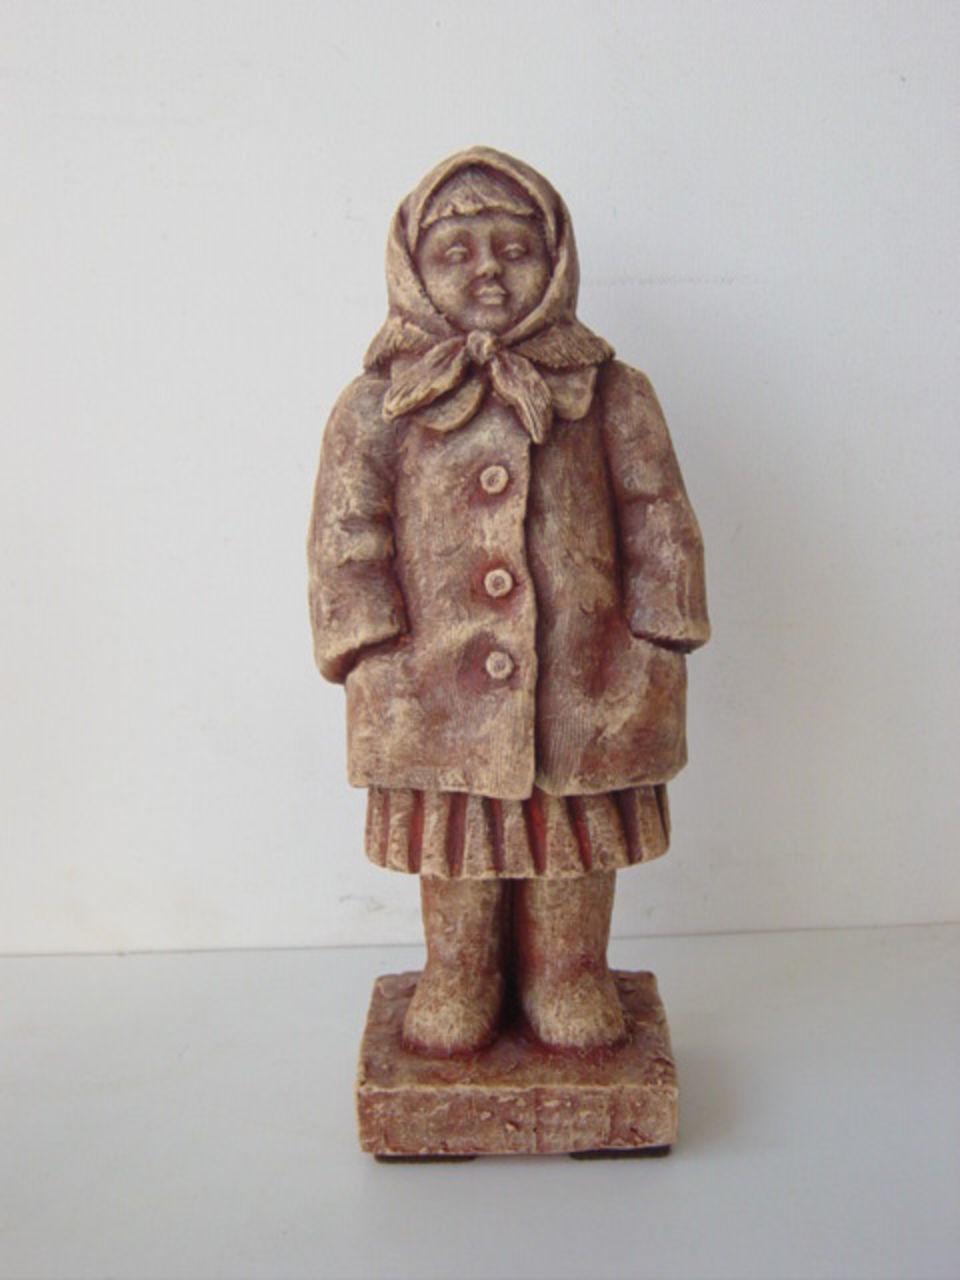 Nellka (Nelya Kantserova) Maroussia